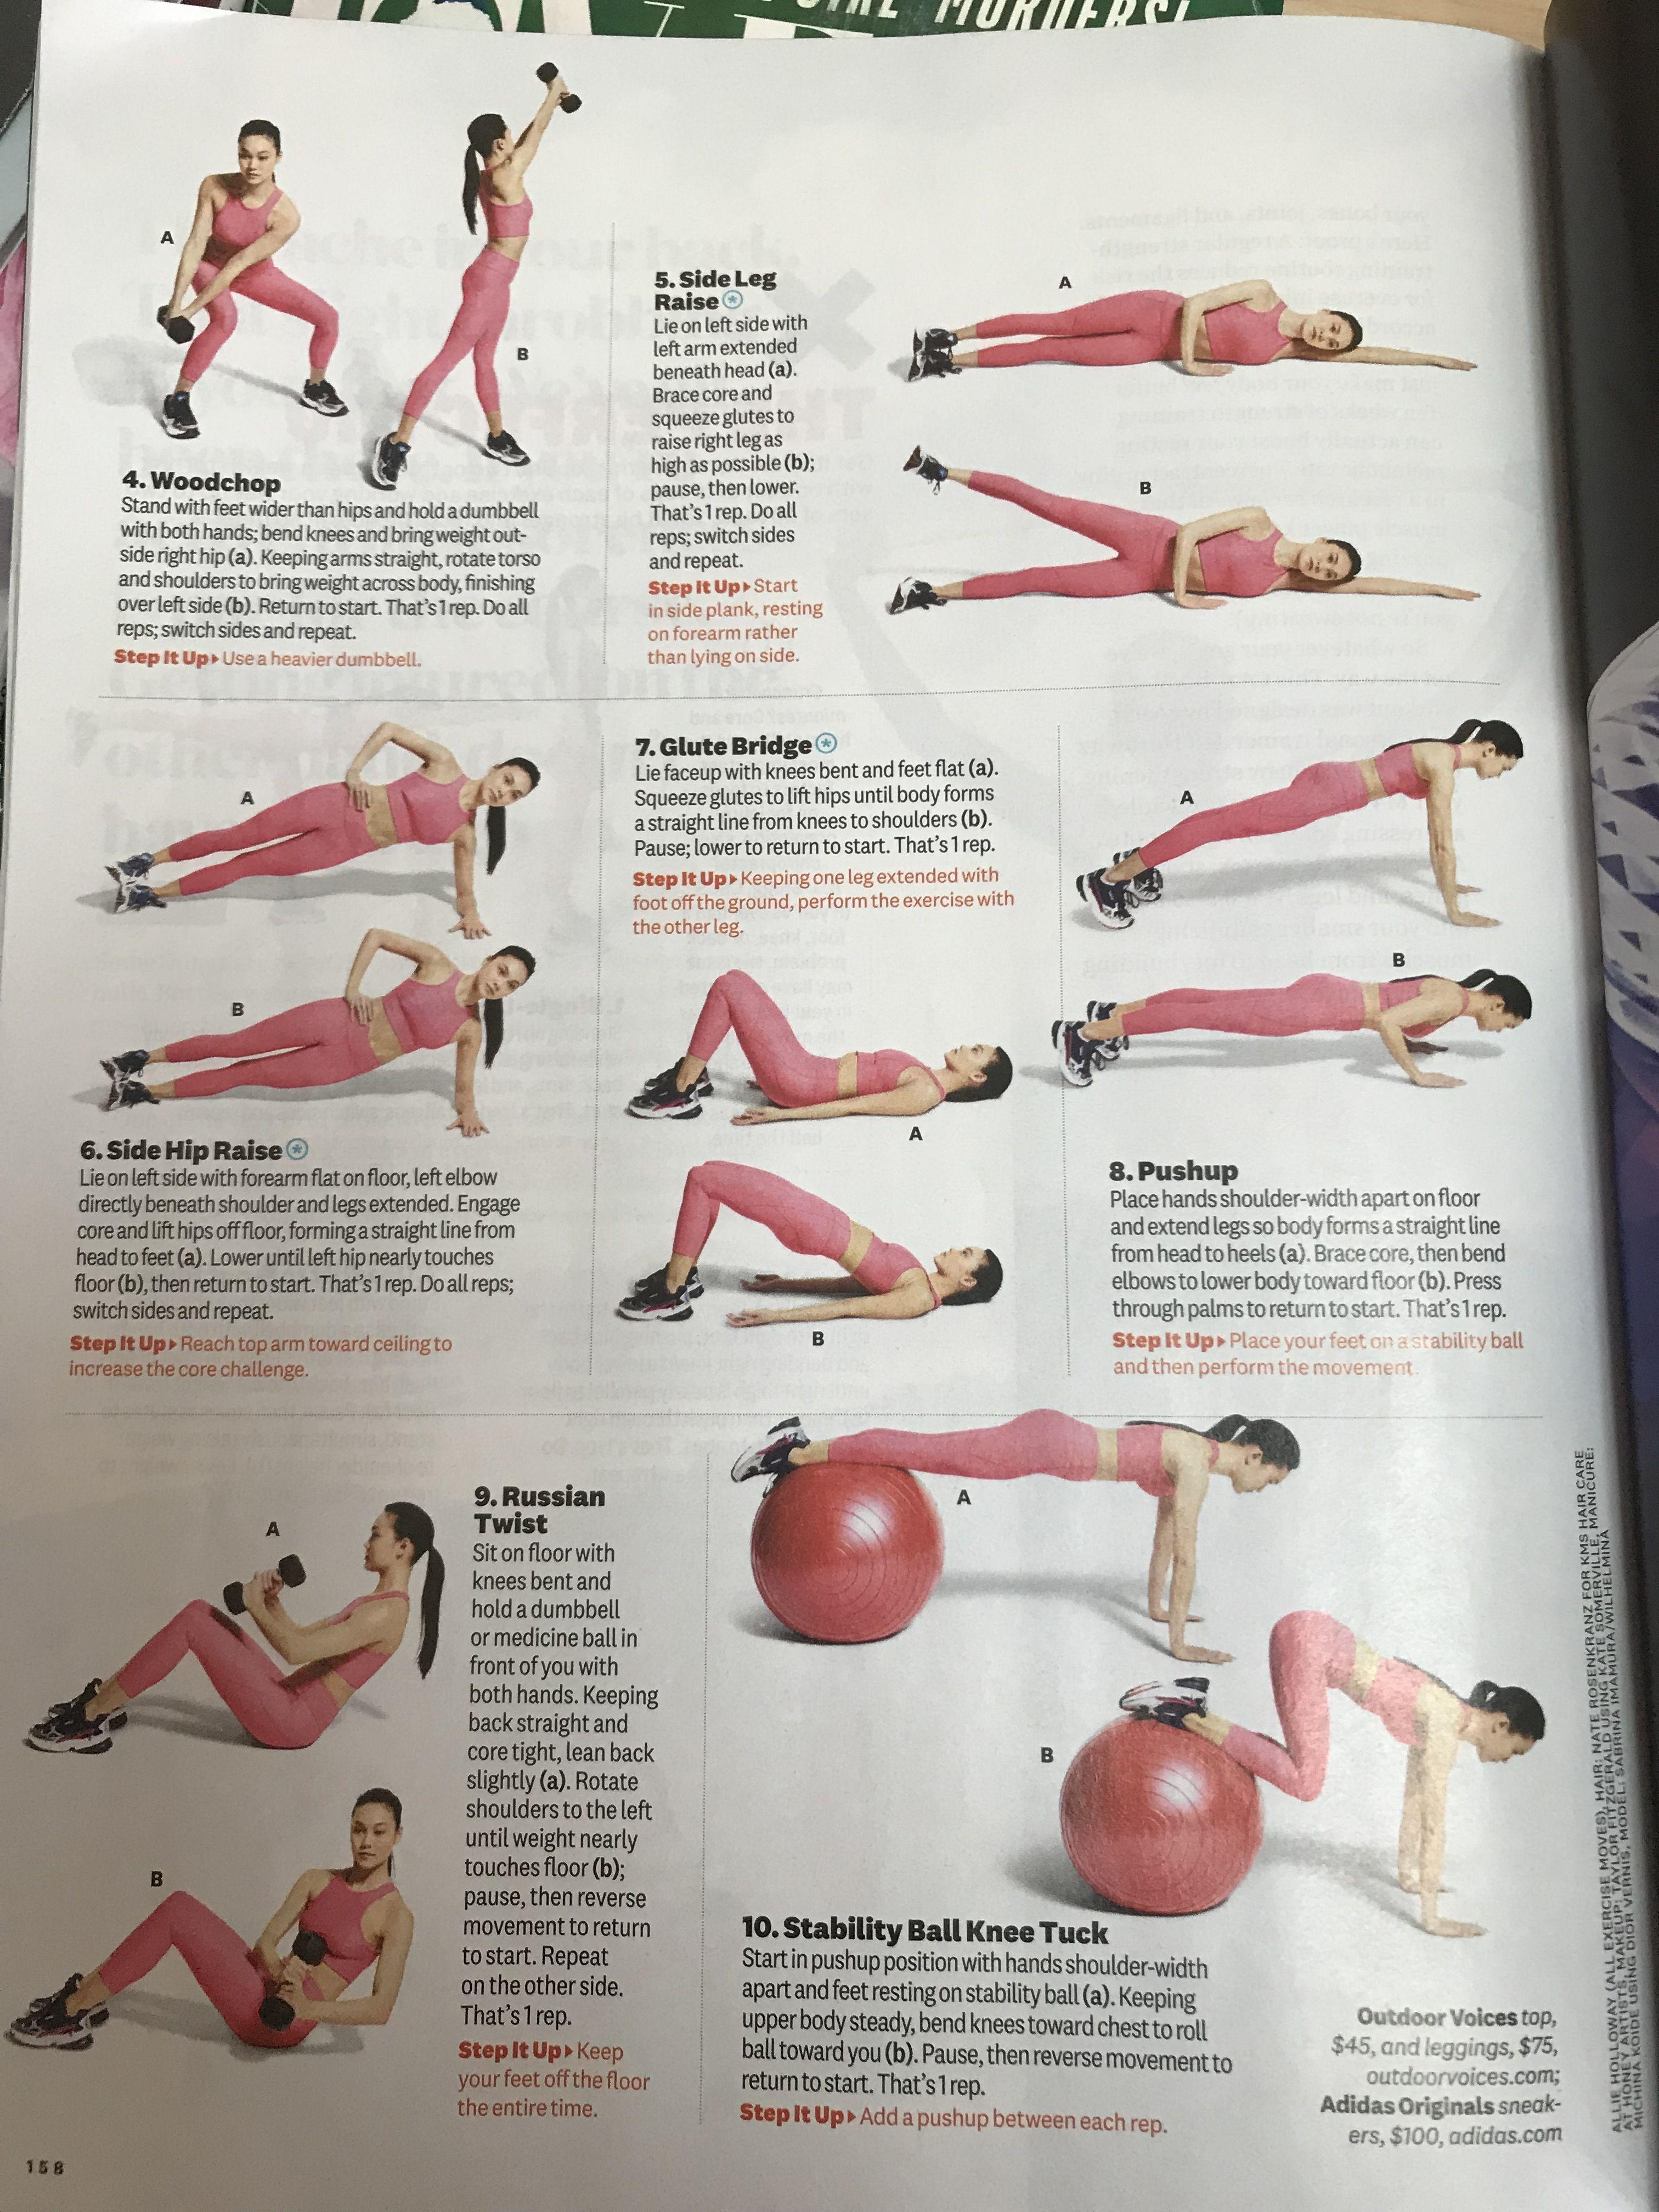 Pin By Warrette Coleman On Fitness Health Glute Bridge Body Form Hip Raises